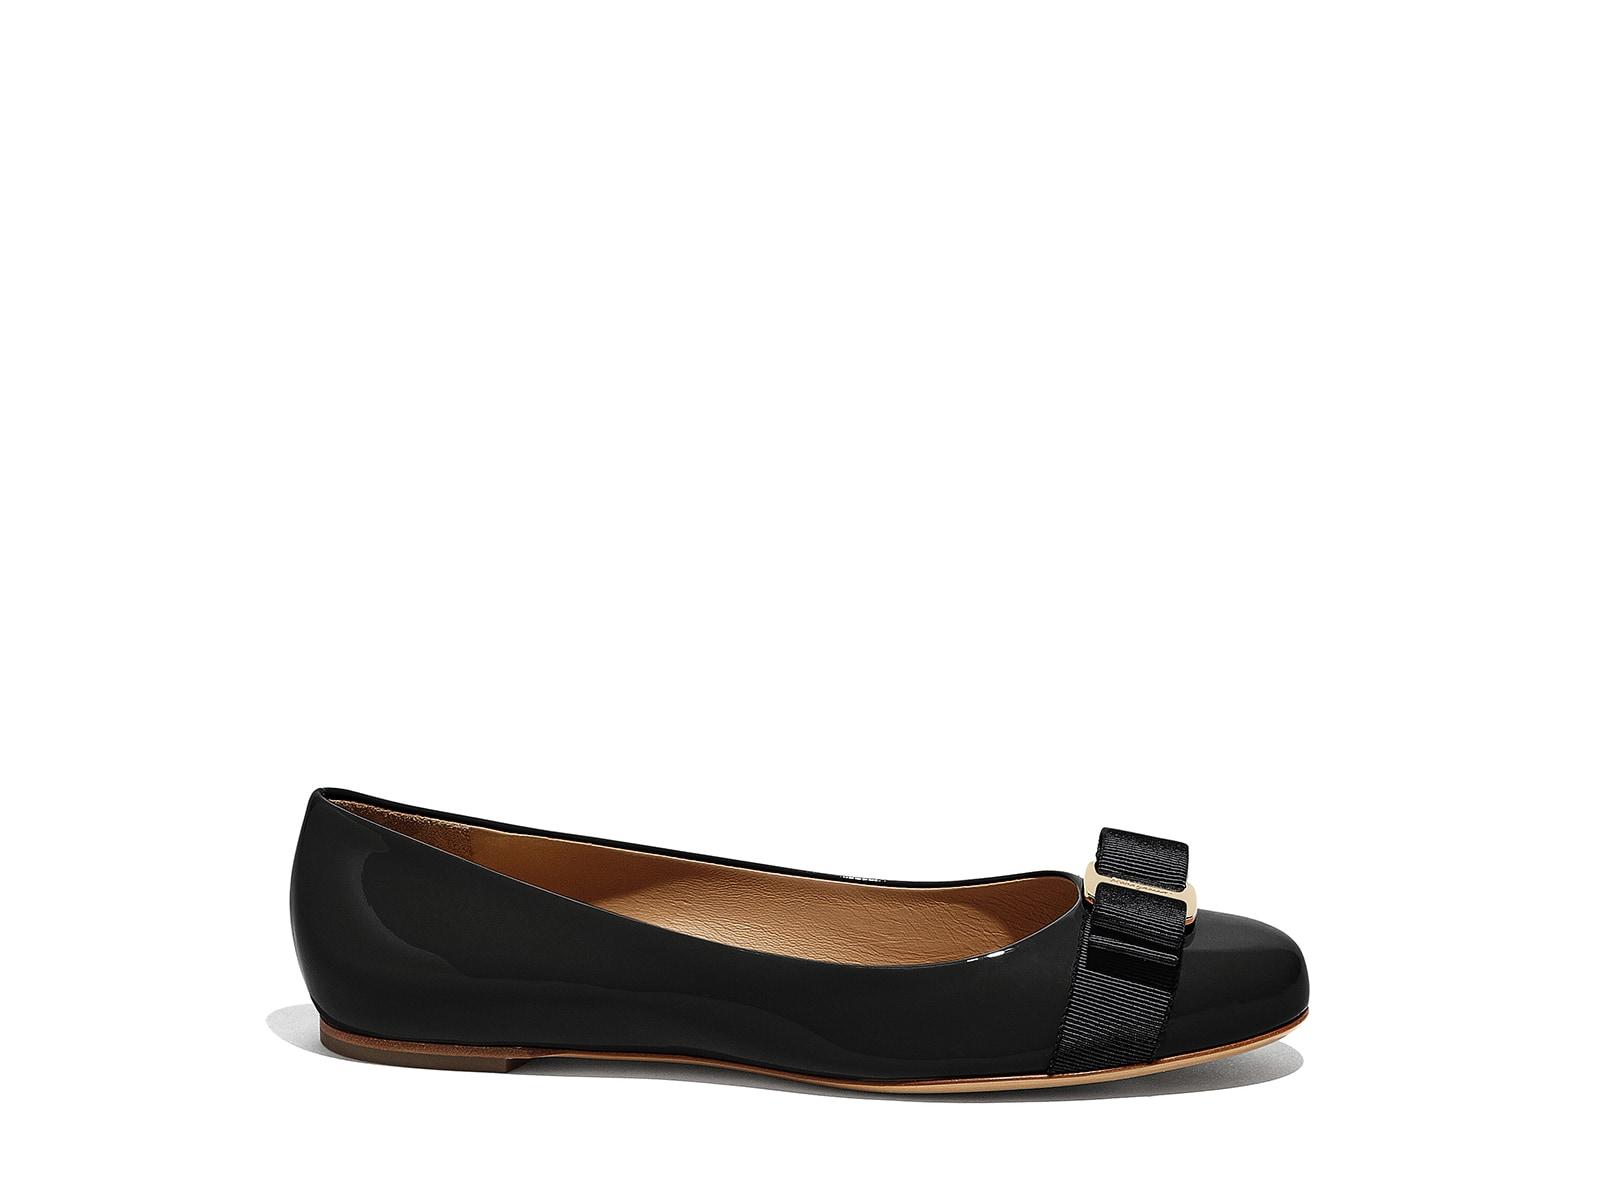 varina ballet flat ballerinas shoes